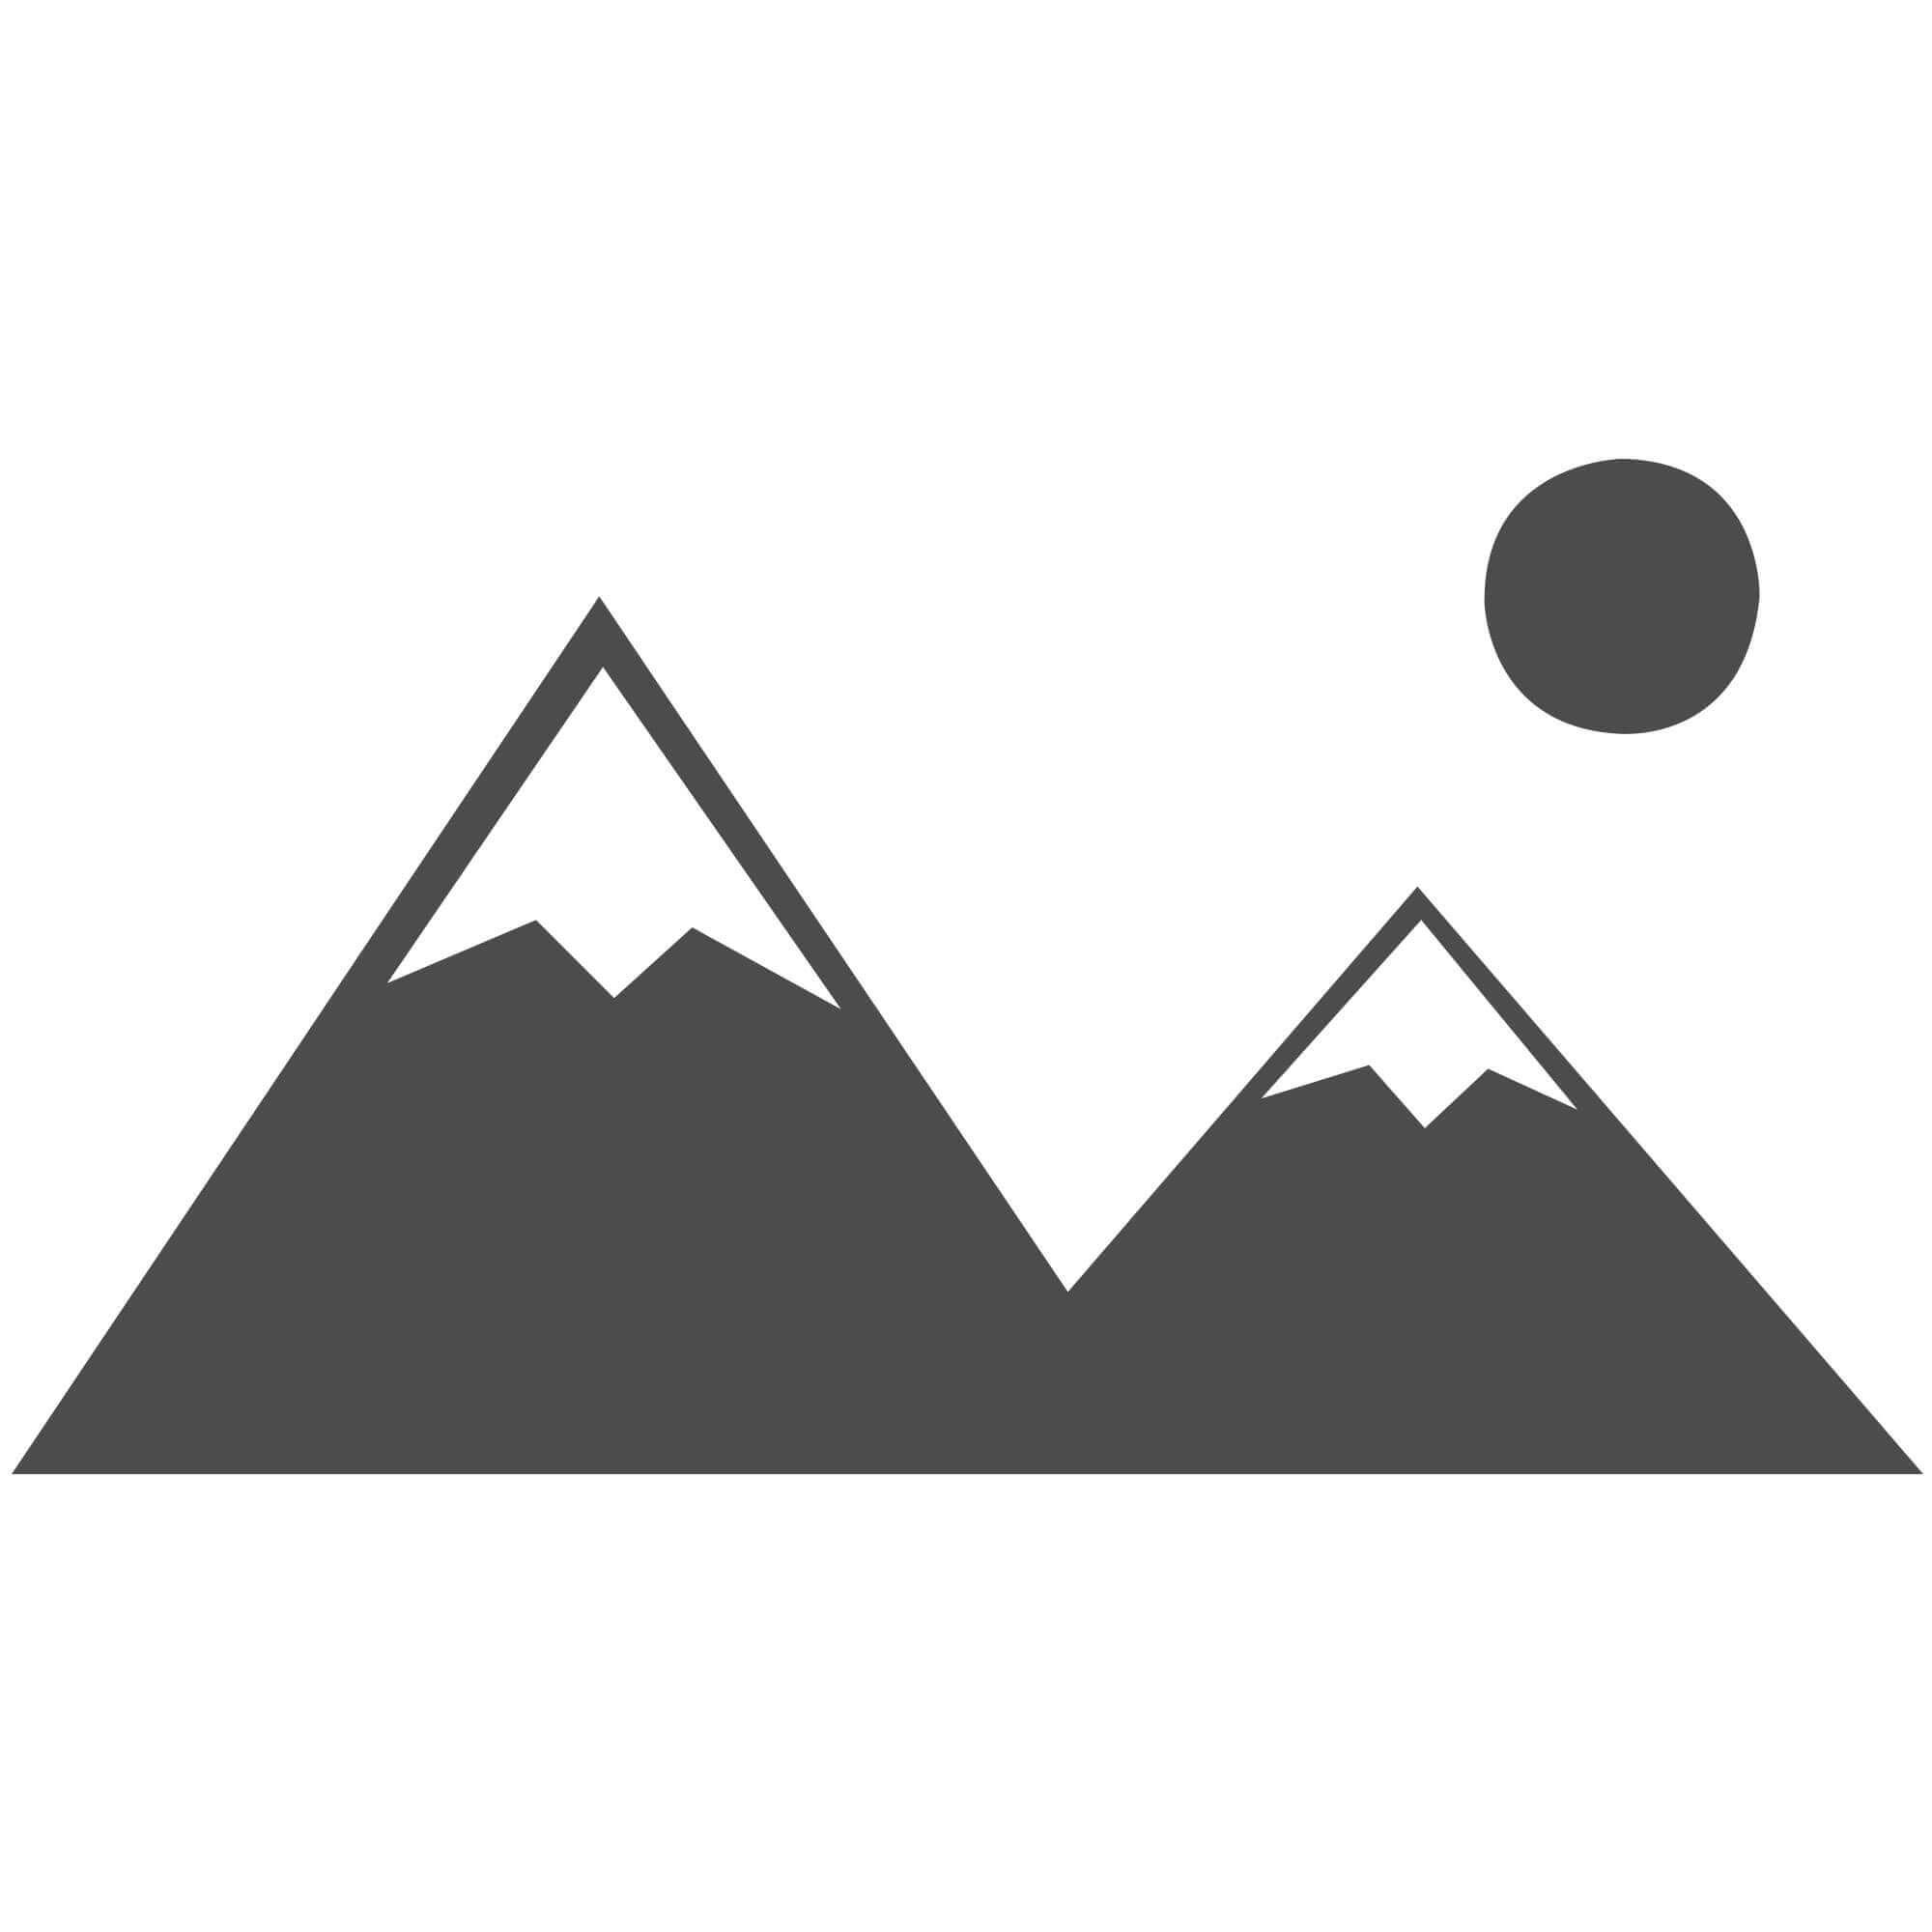 "Athena Shaggy Rug - Red - Size 140 x 200 cm (4'7"" x 6'7"")"